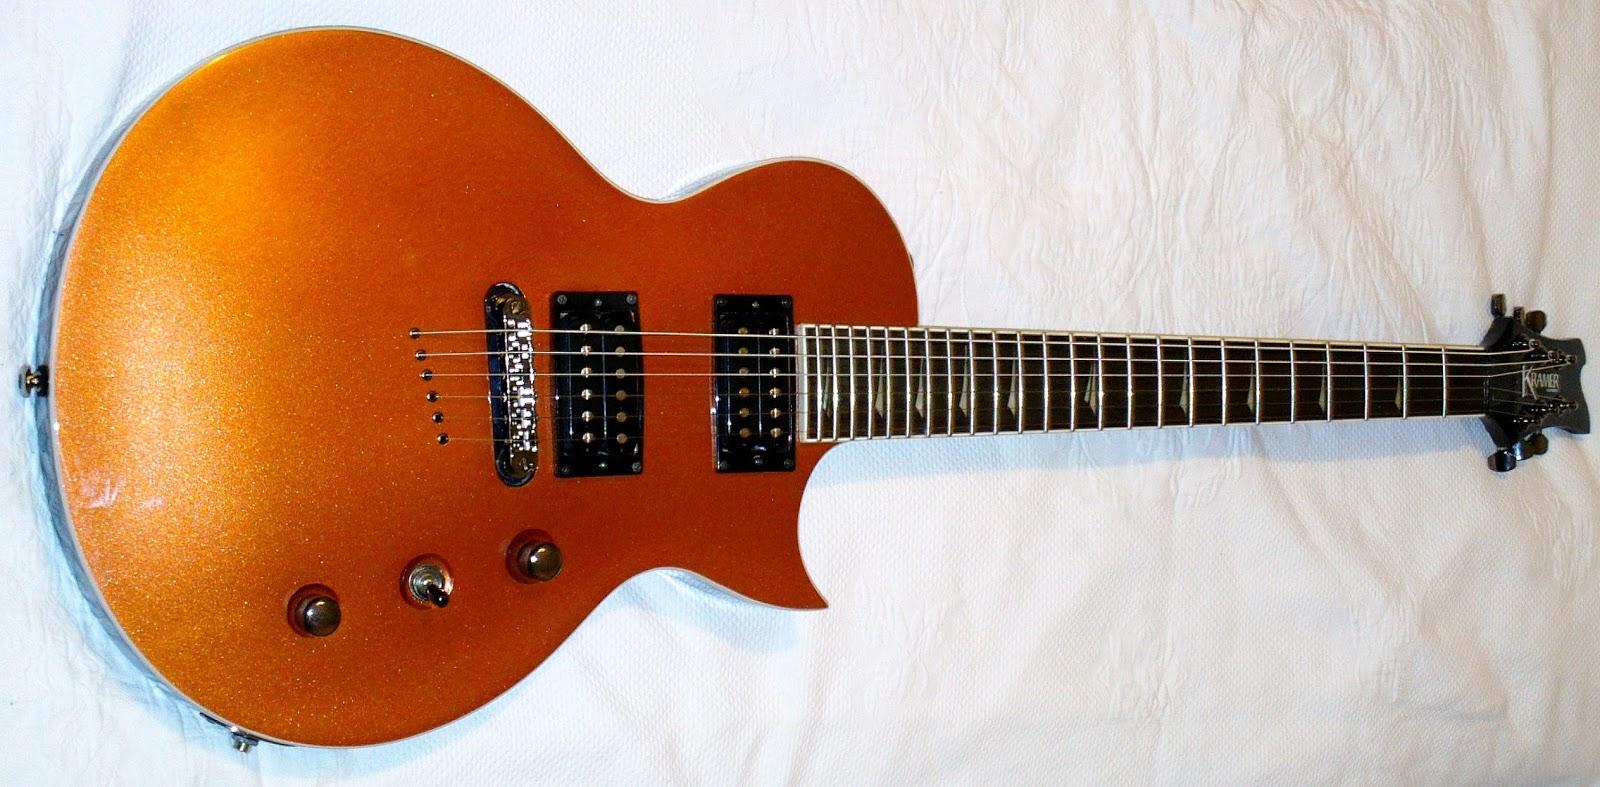 Kramer Assault 220 Copper Top Guitar Dreamer Wiring Diagrams